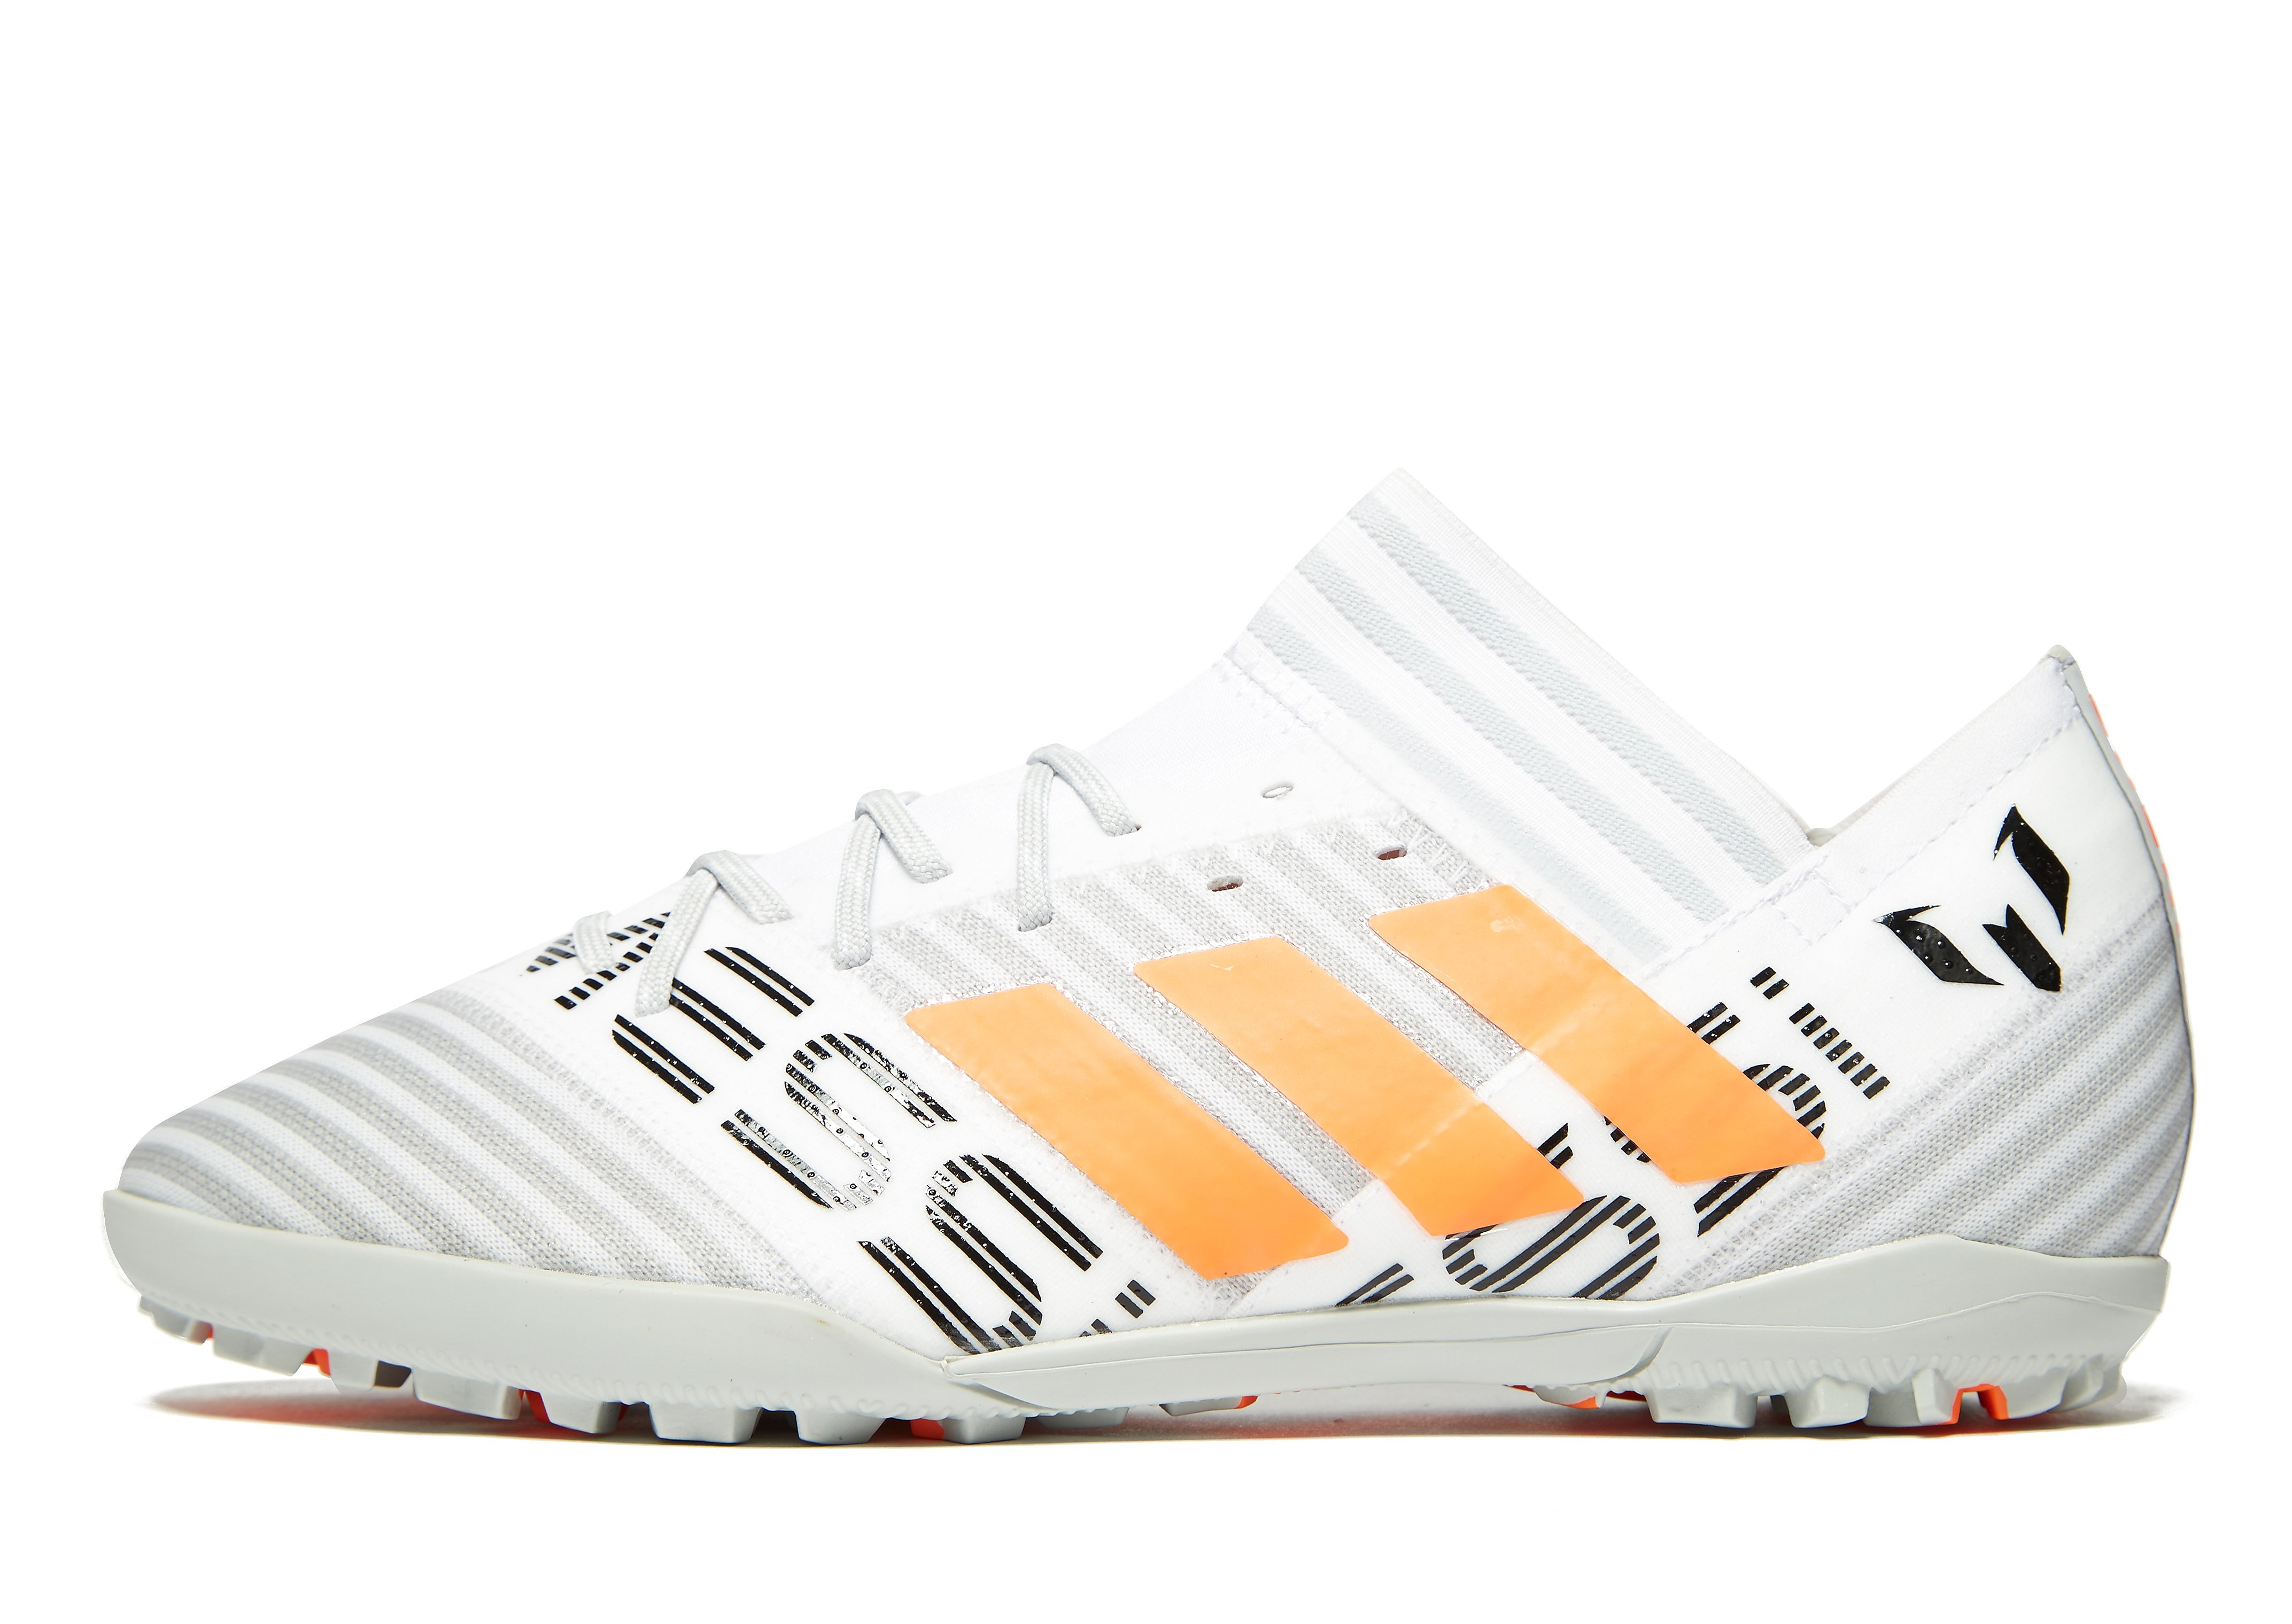 adidas Pyro Storm Nemeziz Messi 17.3 TF